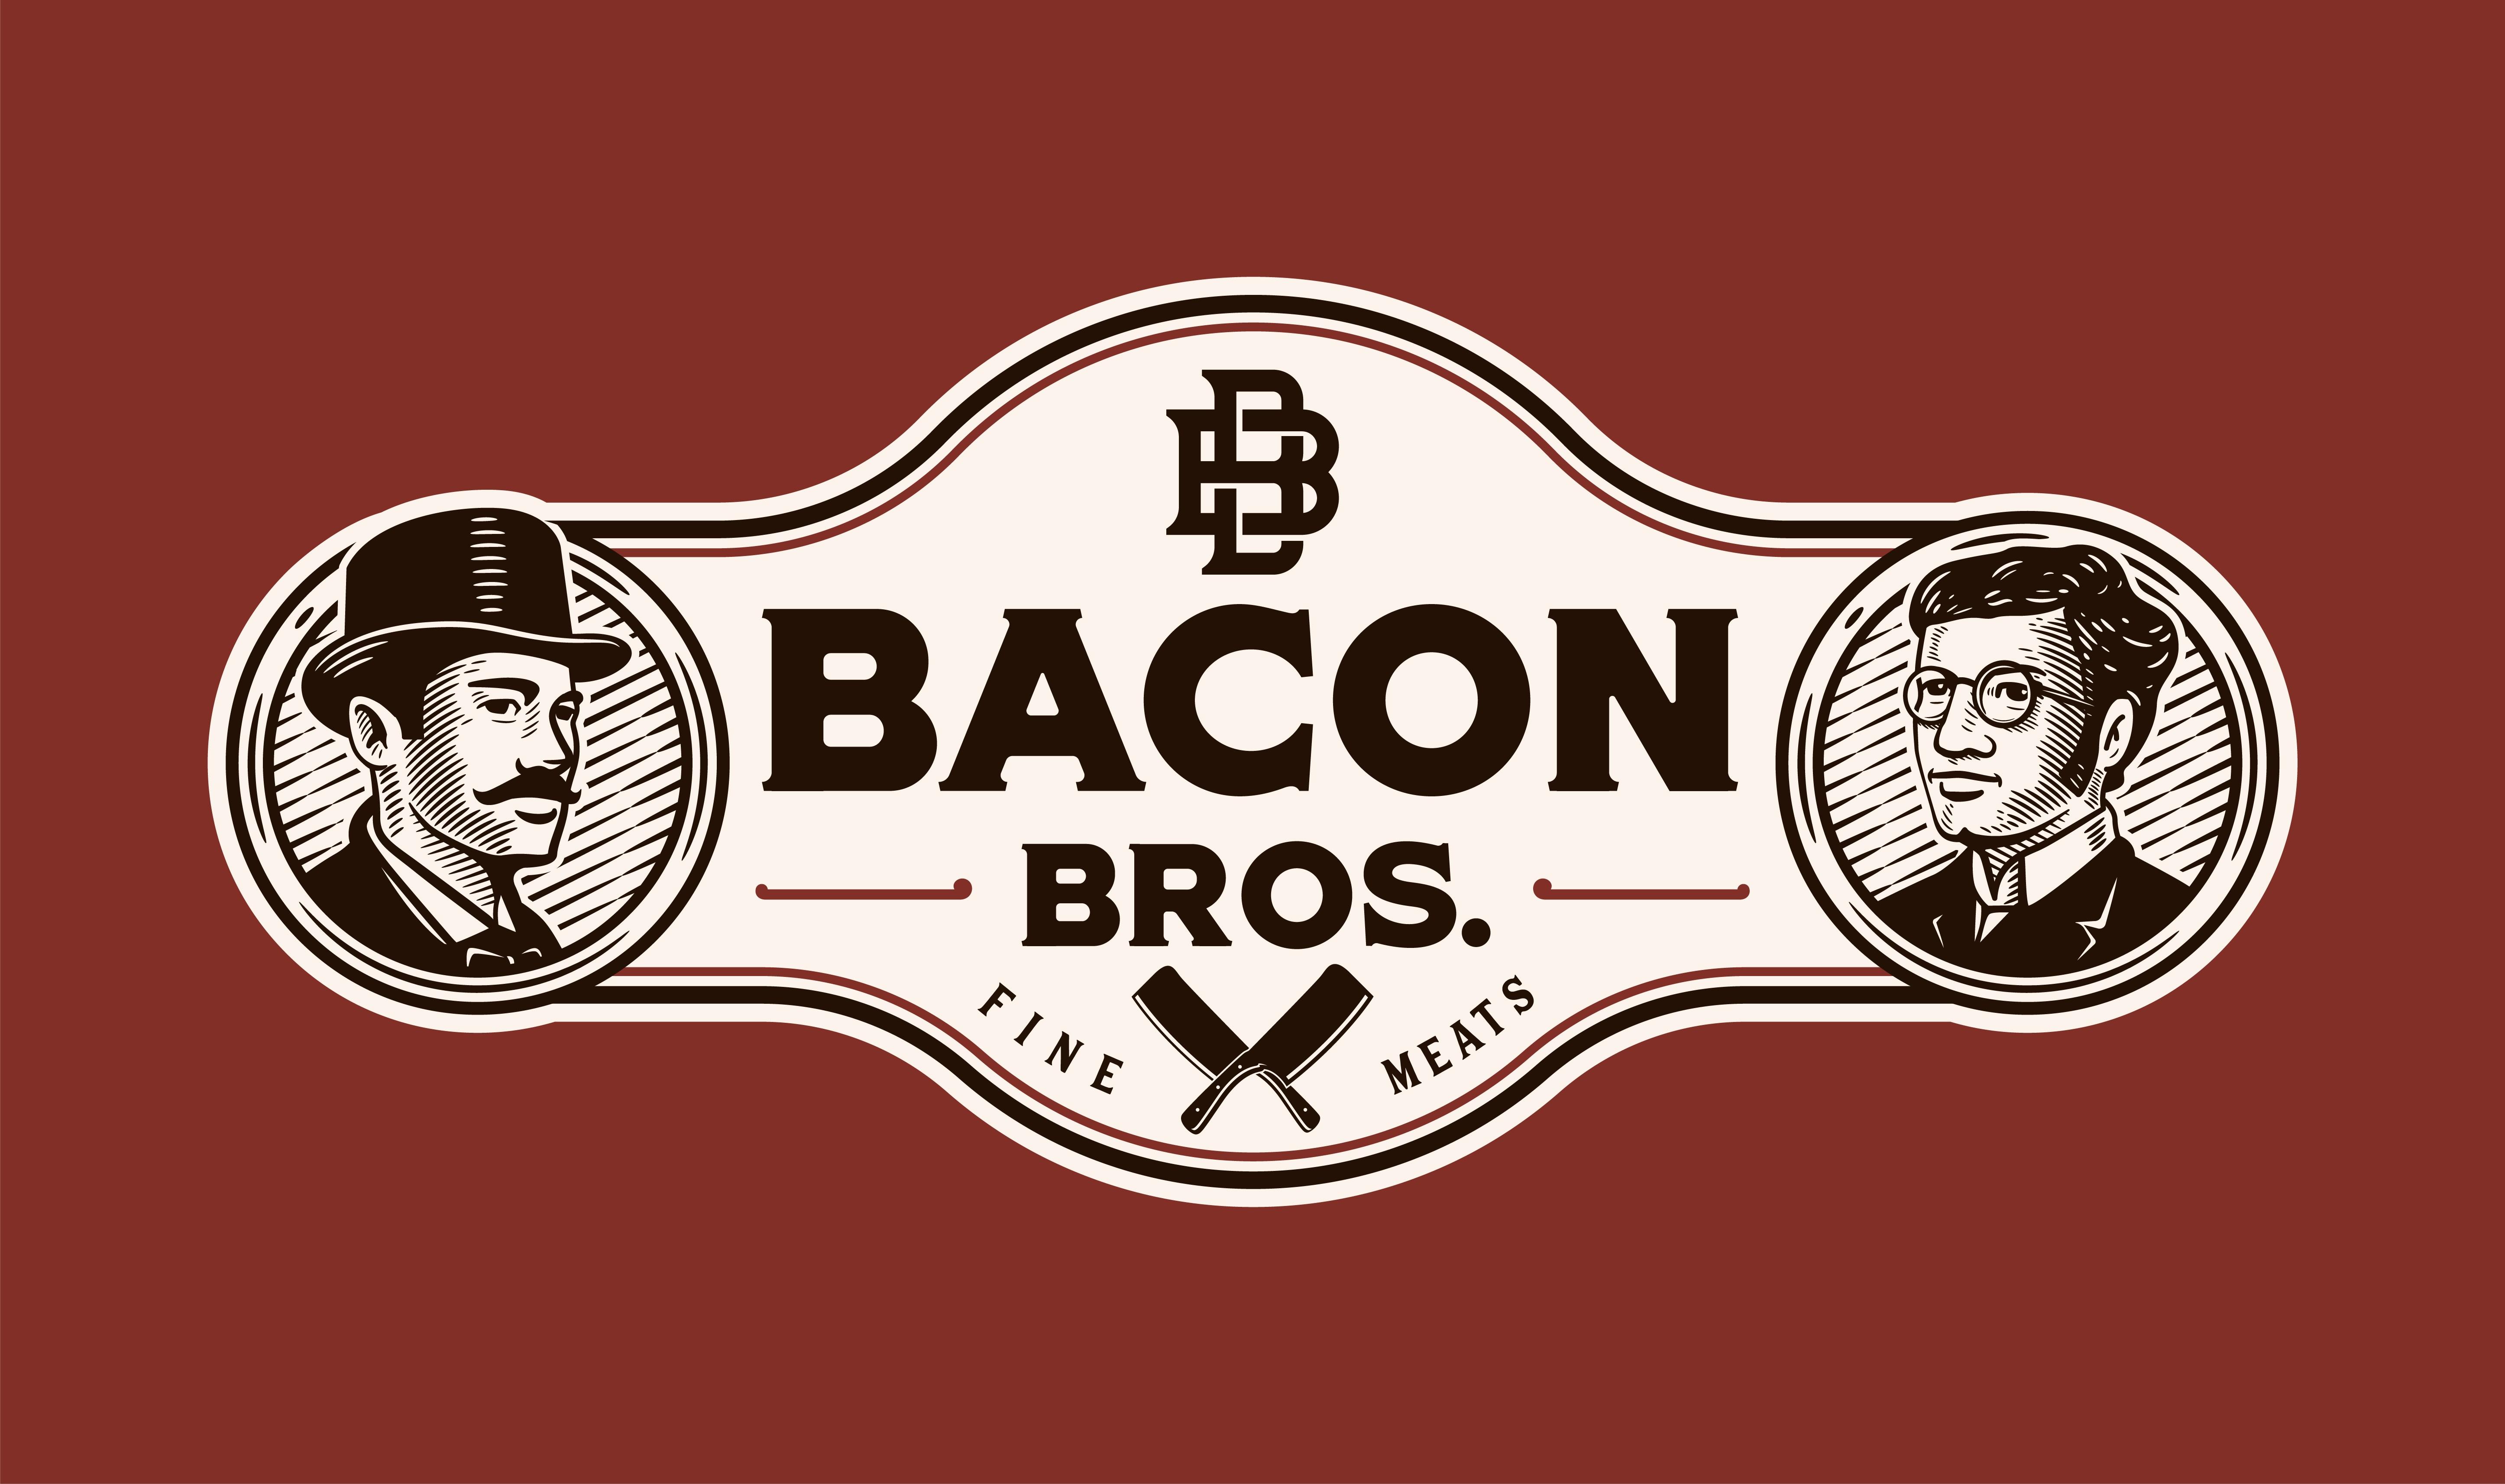 Gourmet bacon delivery company needs a logo